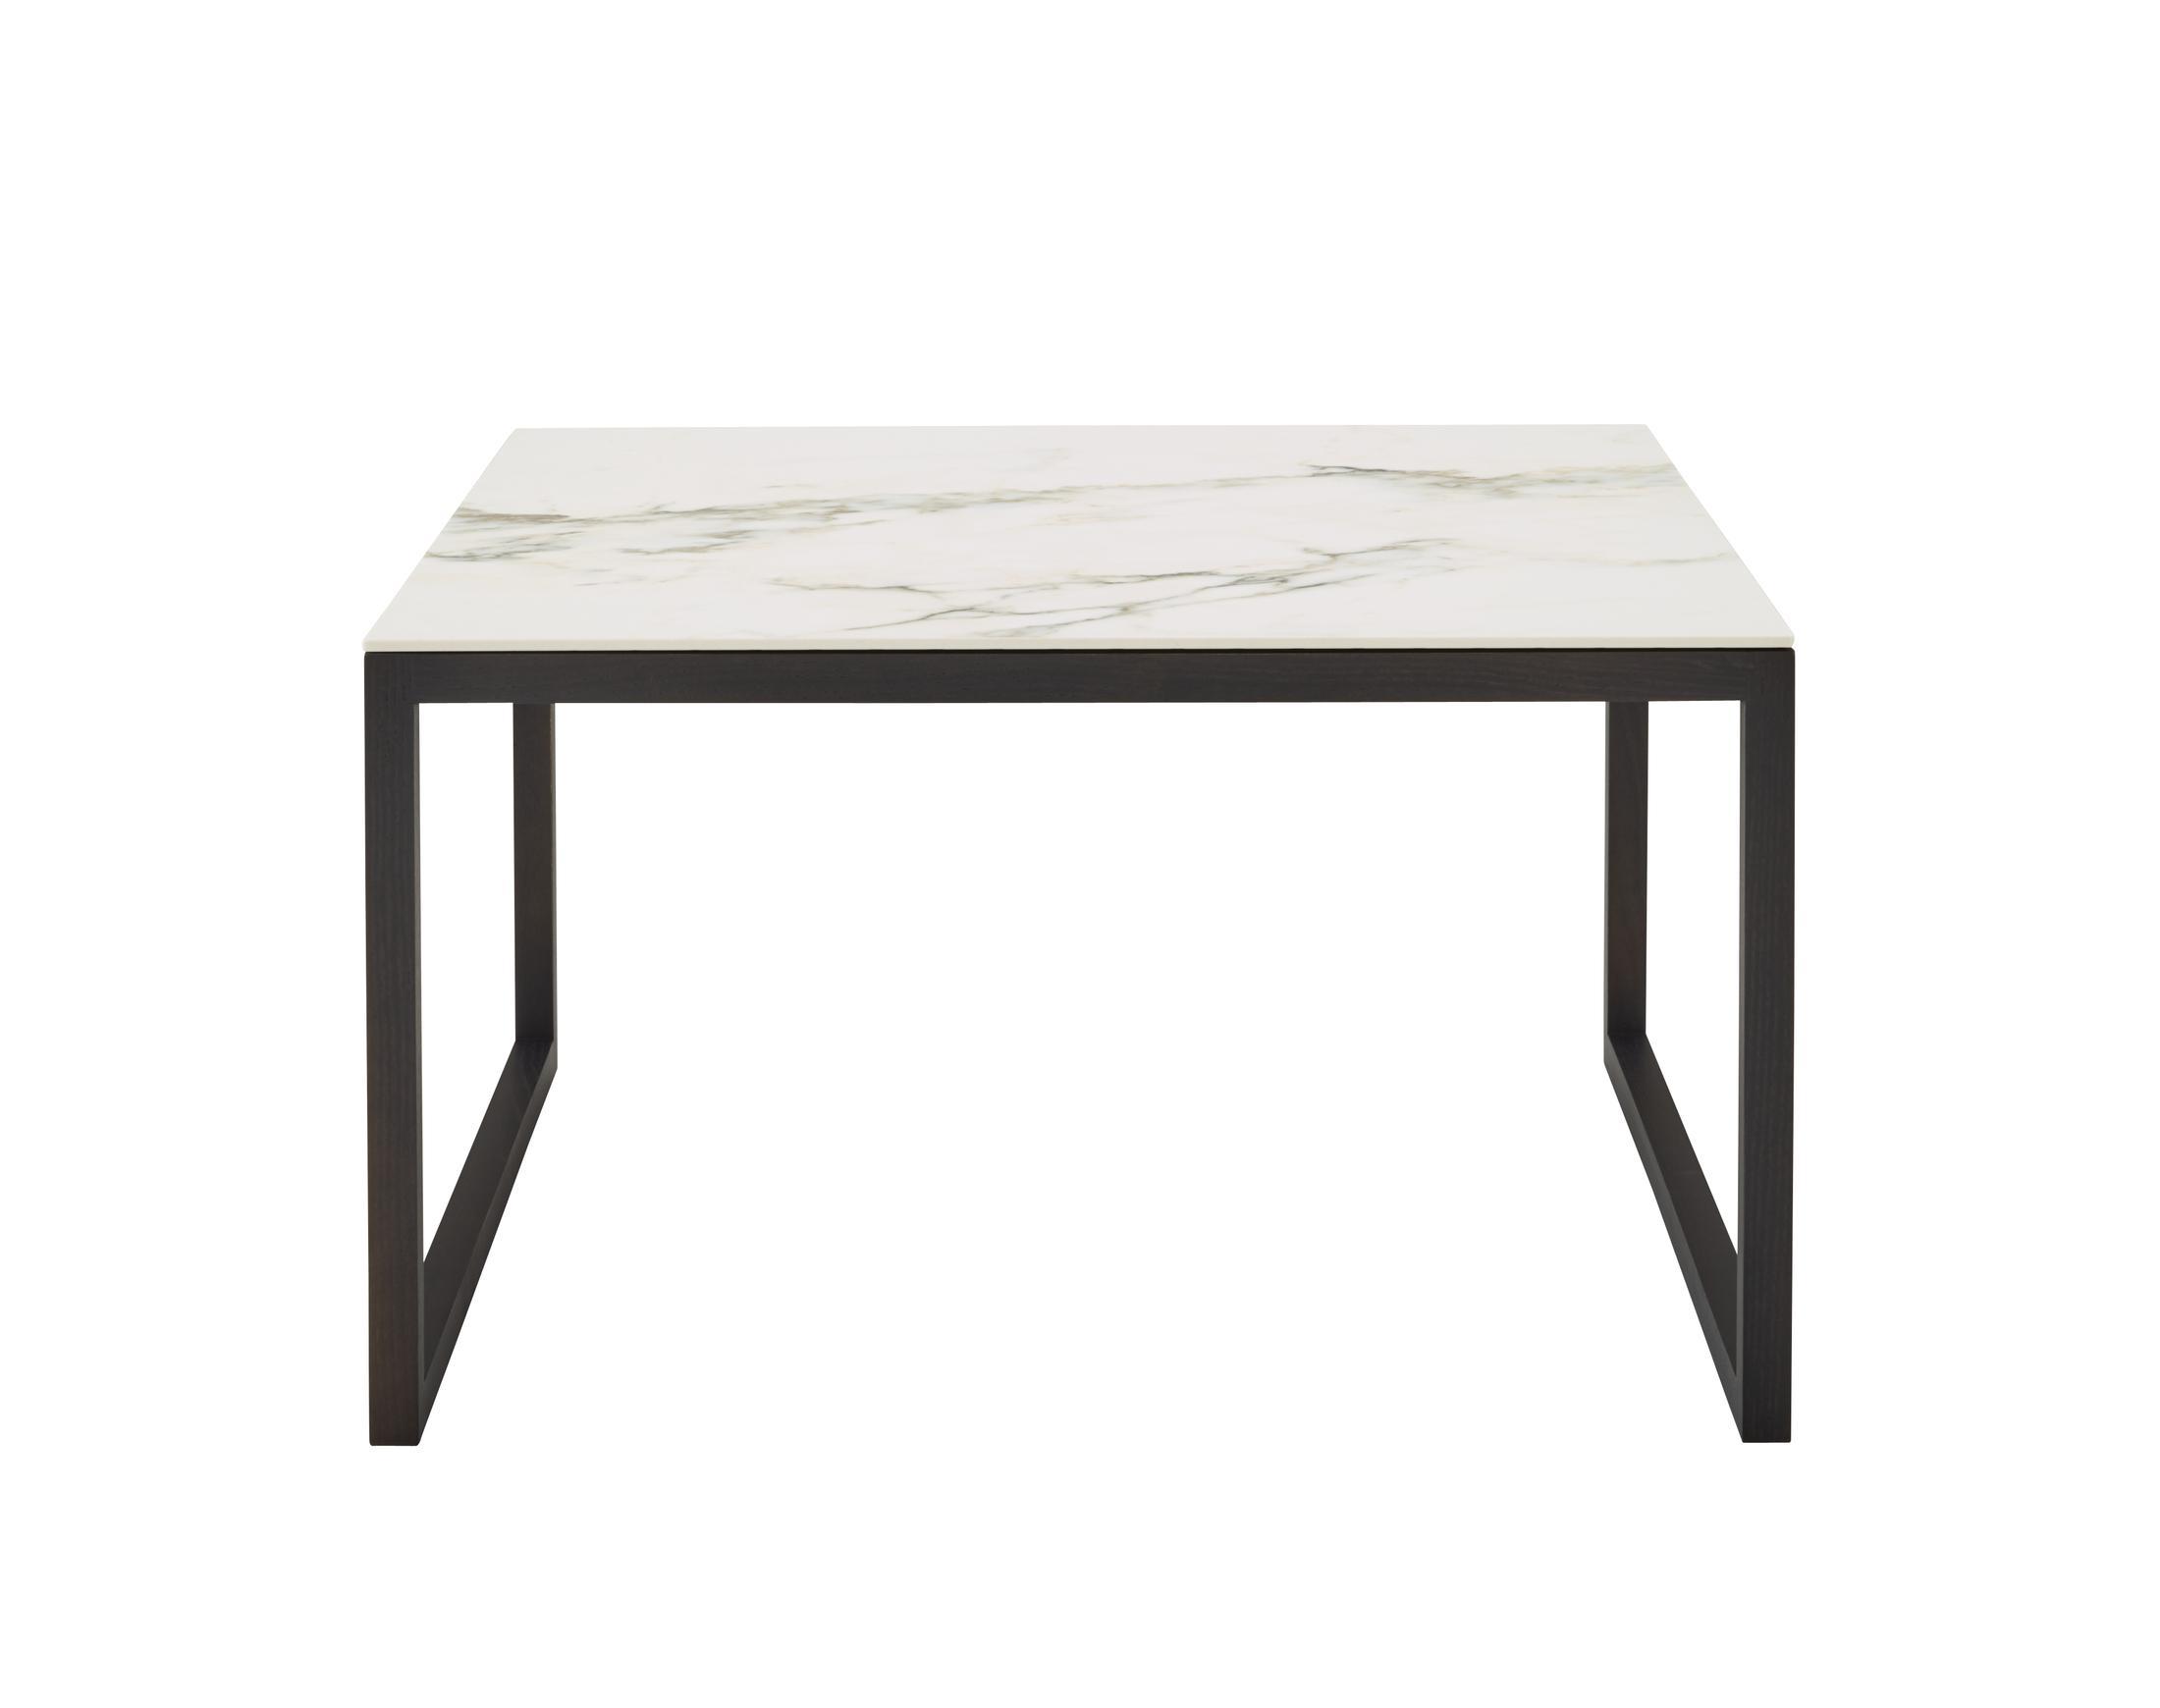 ISO, Occasional Tables From Designer : Marie Christine Dorner | Ligne Roset  Official Site